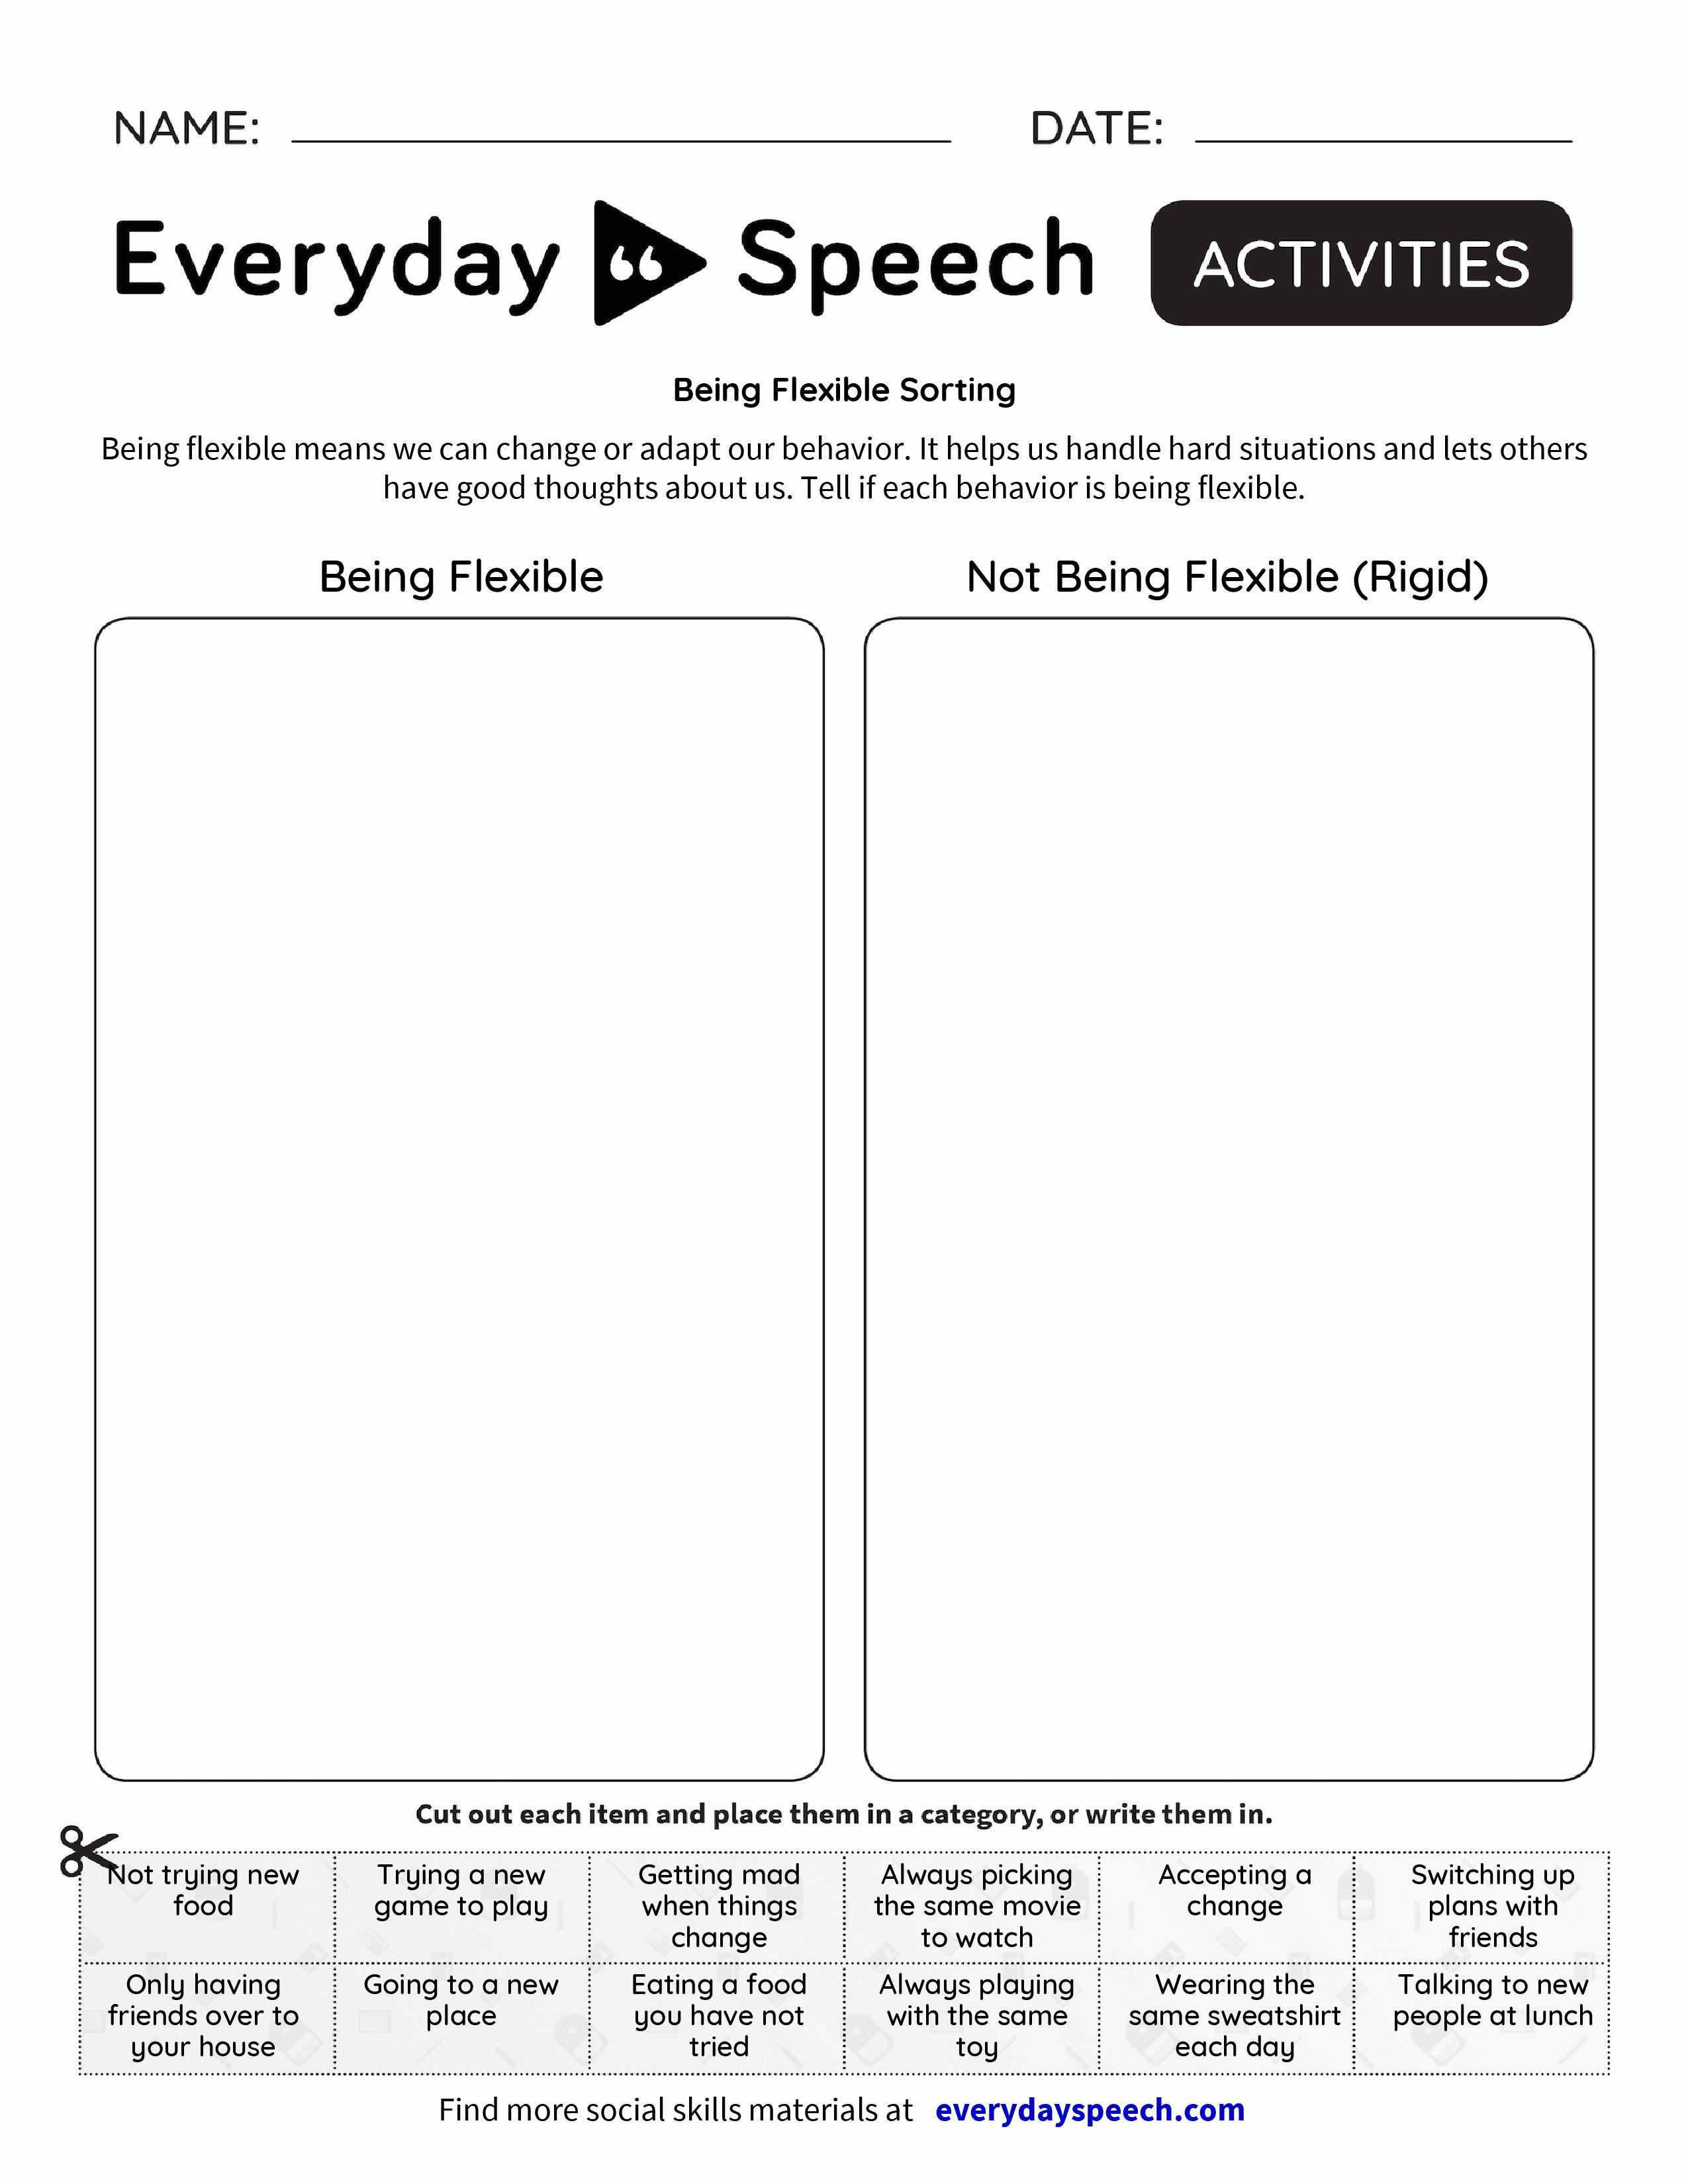 Check Out The Worksheet I Just Made Using Everyday Speech S Worksheet Creator Being Flexible Sort Coping Skills Worksheets Social Skills Program Social Skills